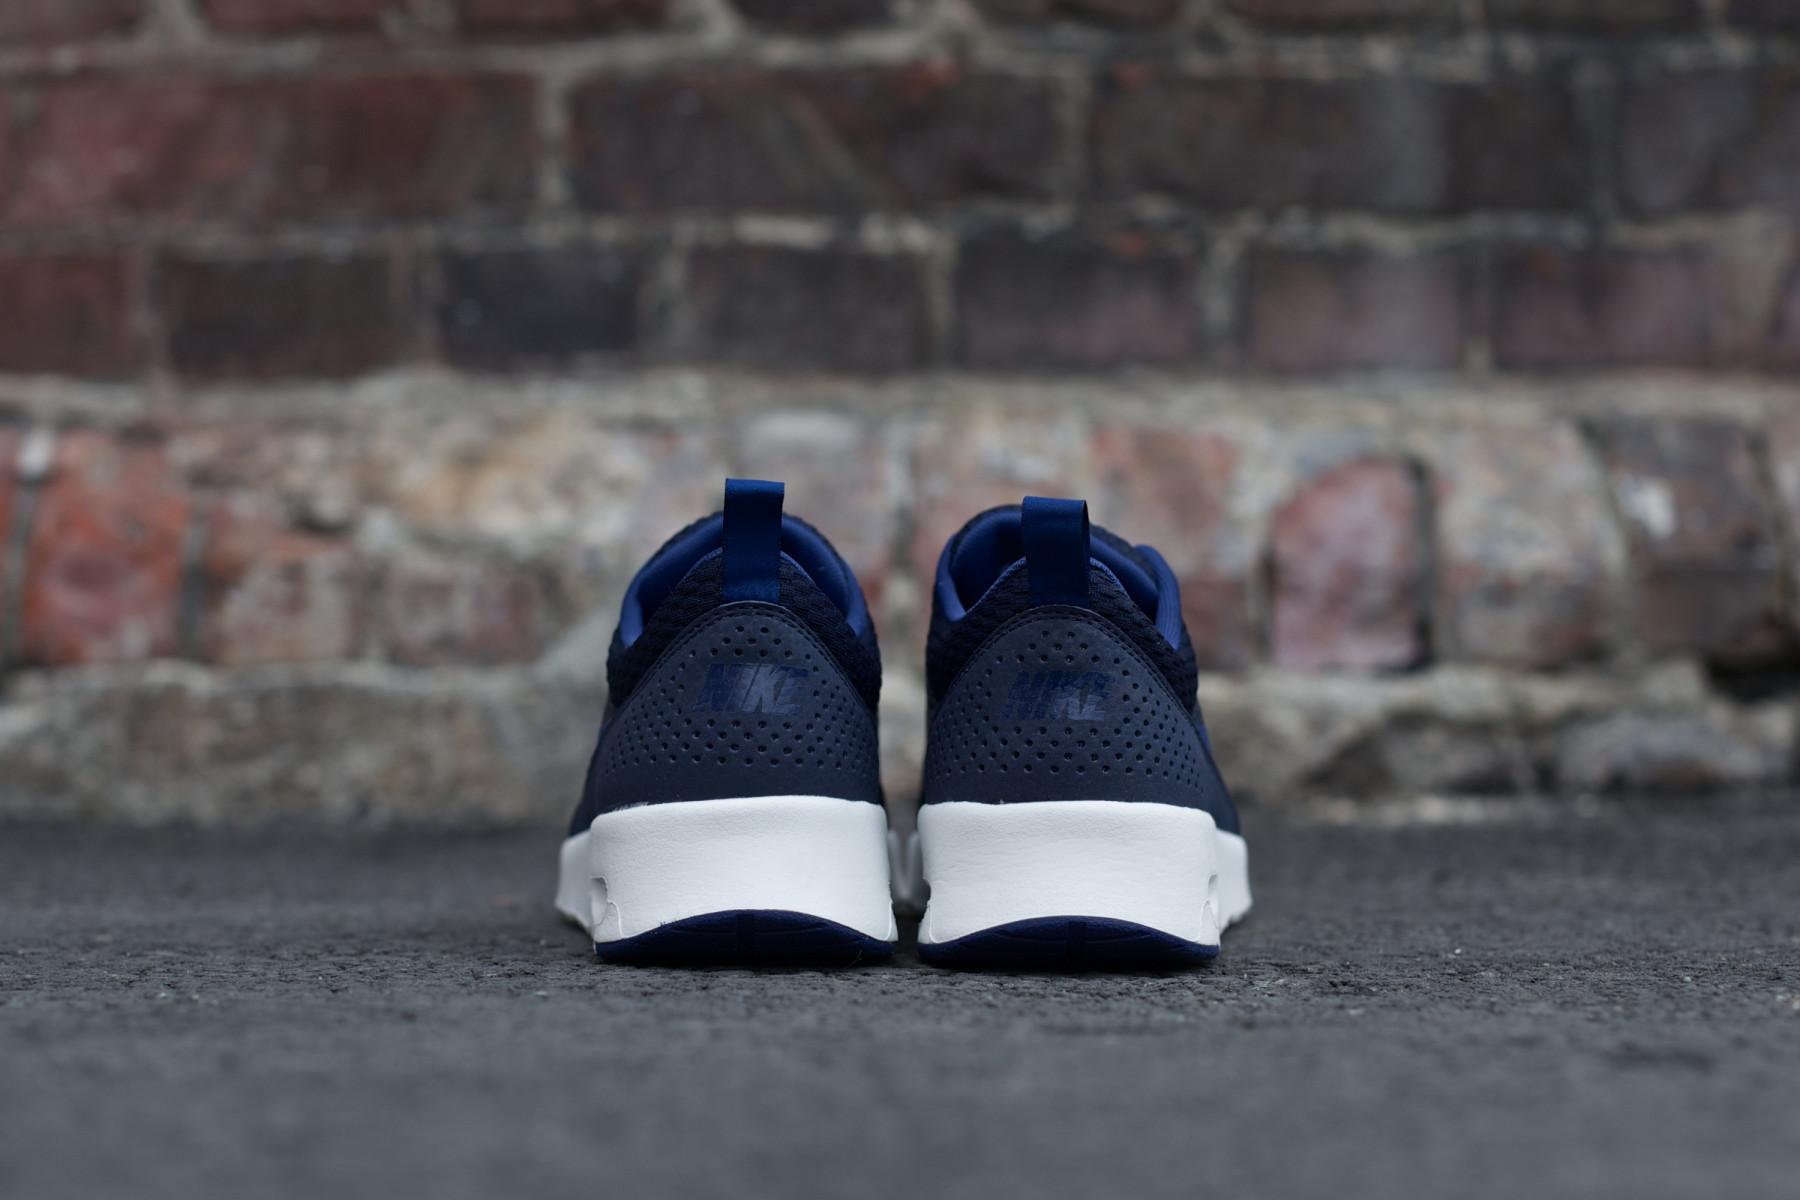 Nike WMNS Air Max Thea Print | Blue | Sneakers | 599408 401